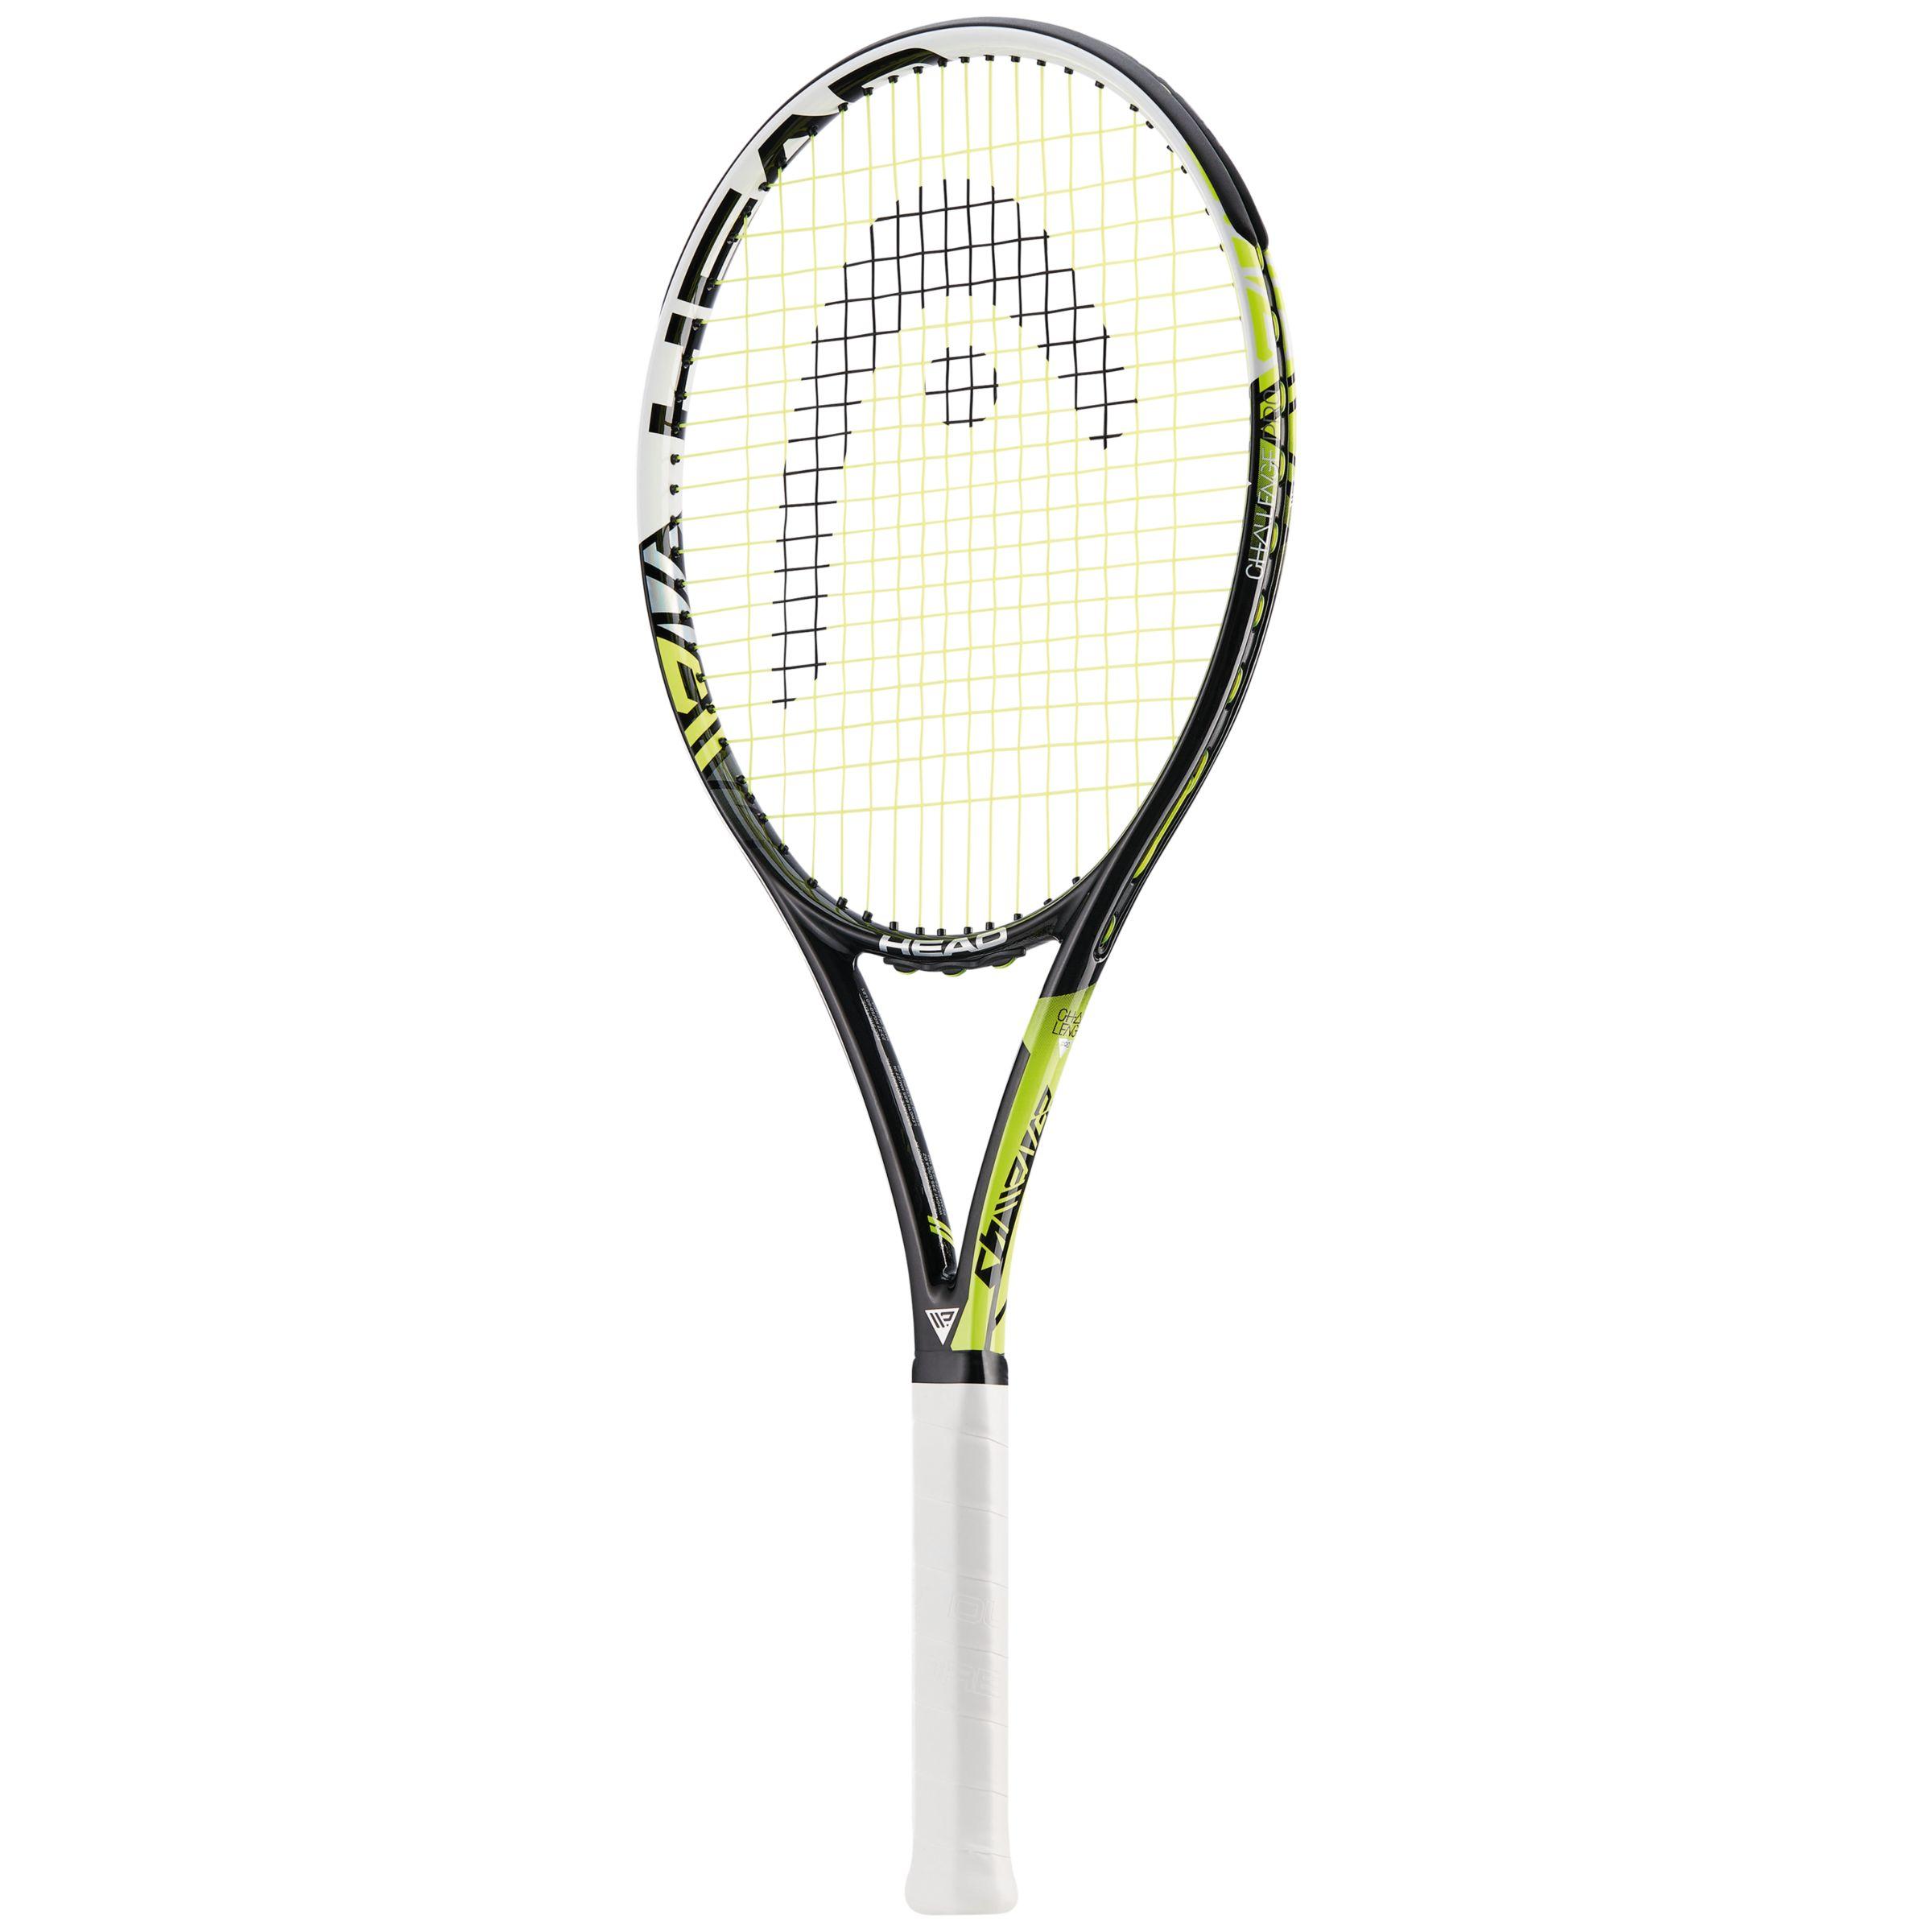 Head Head Challenge Pro Graphite Tennis Racket